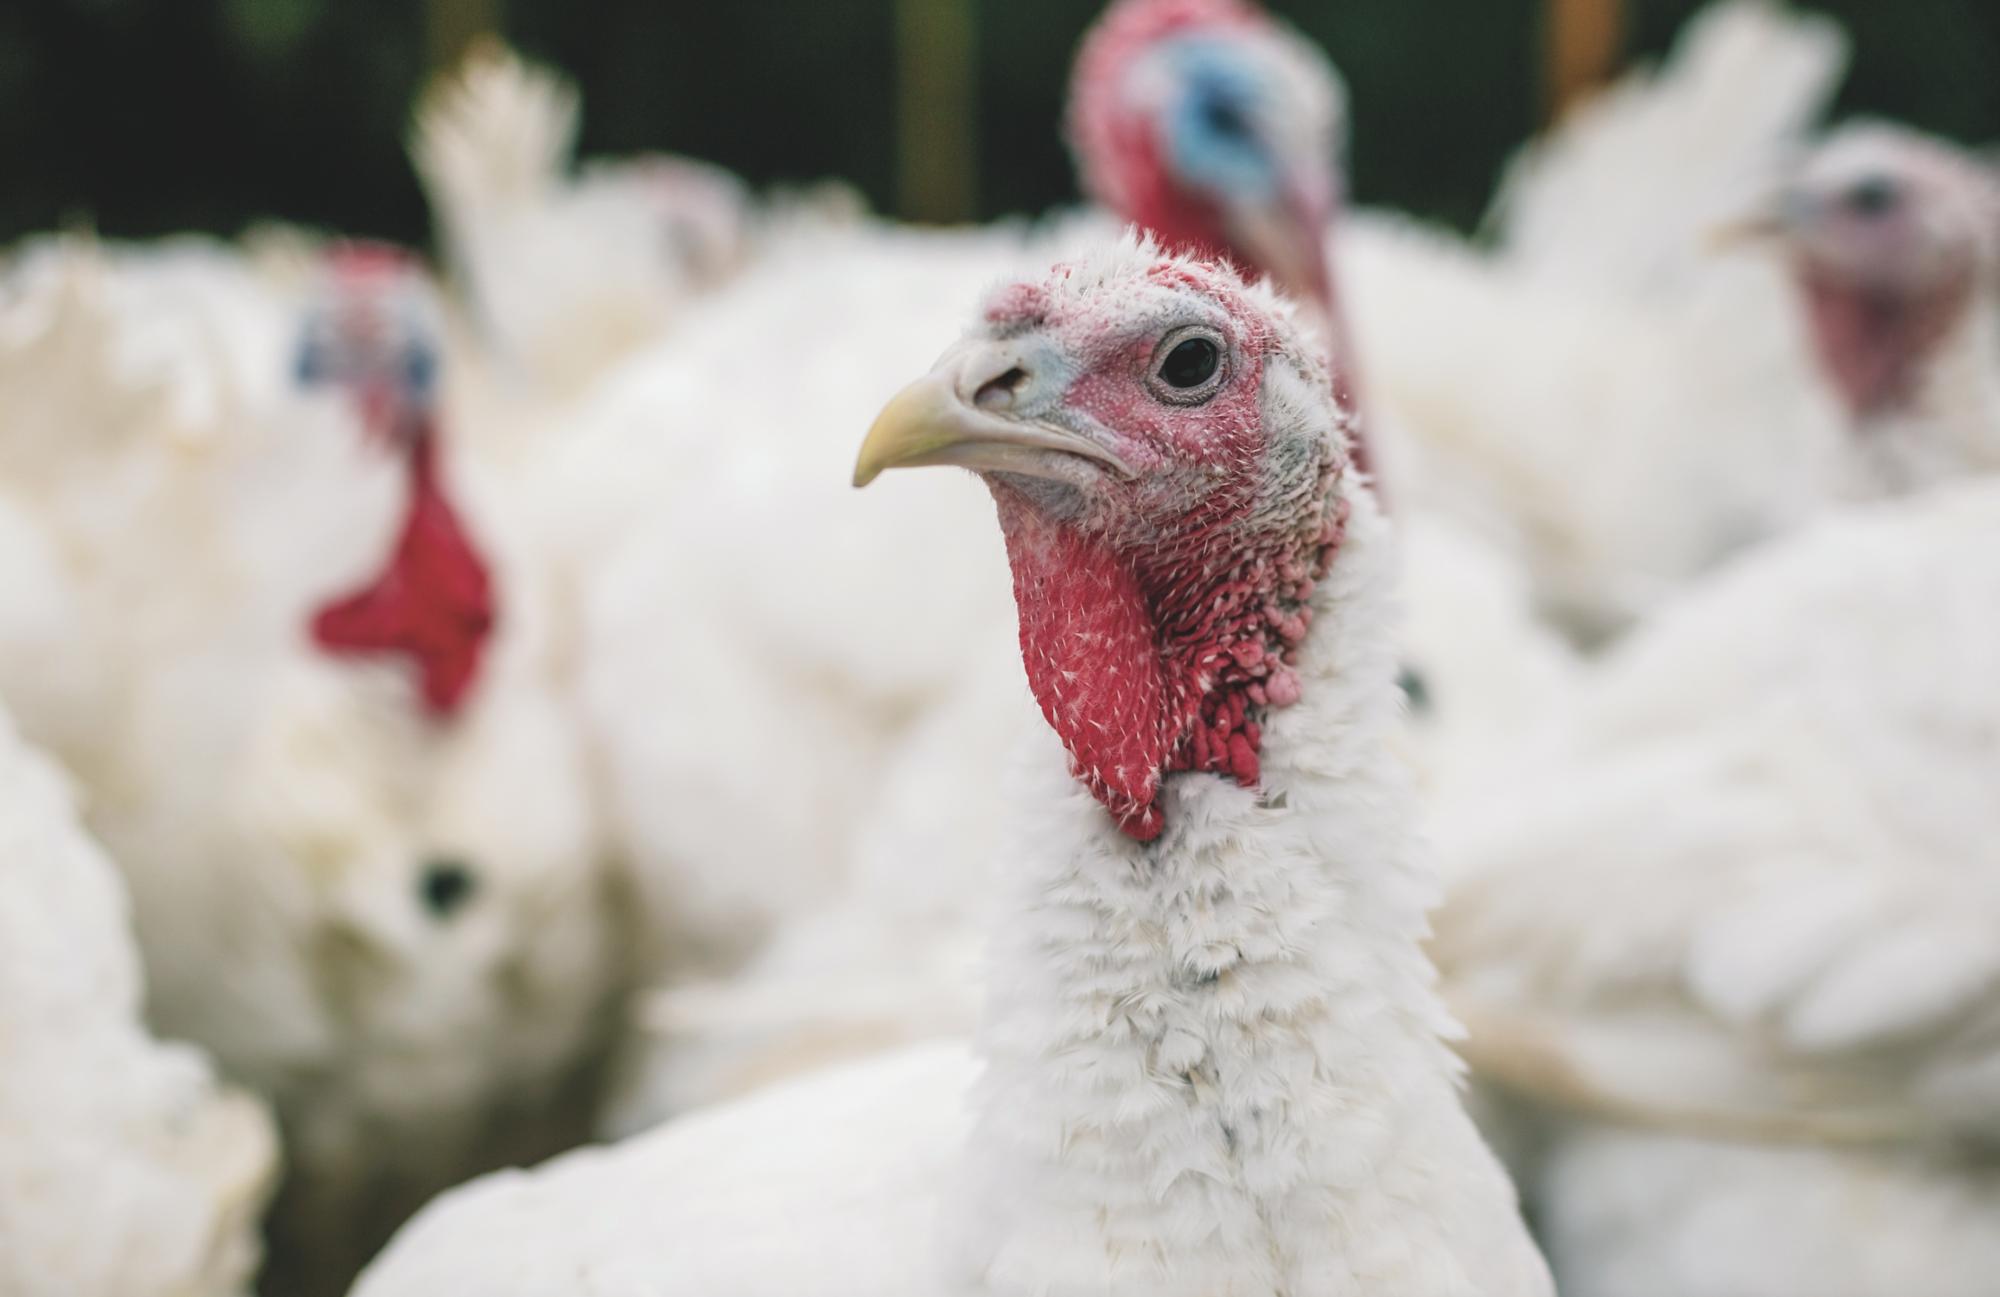 Prepare now for the avian influenza risk period